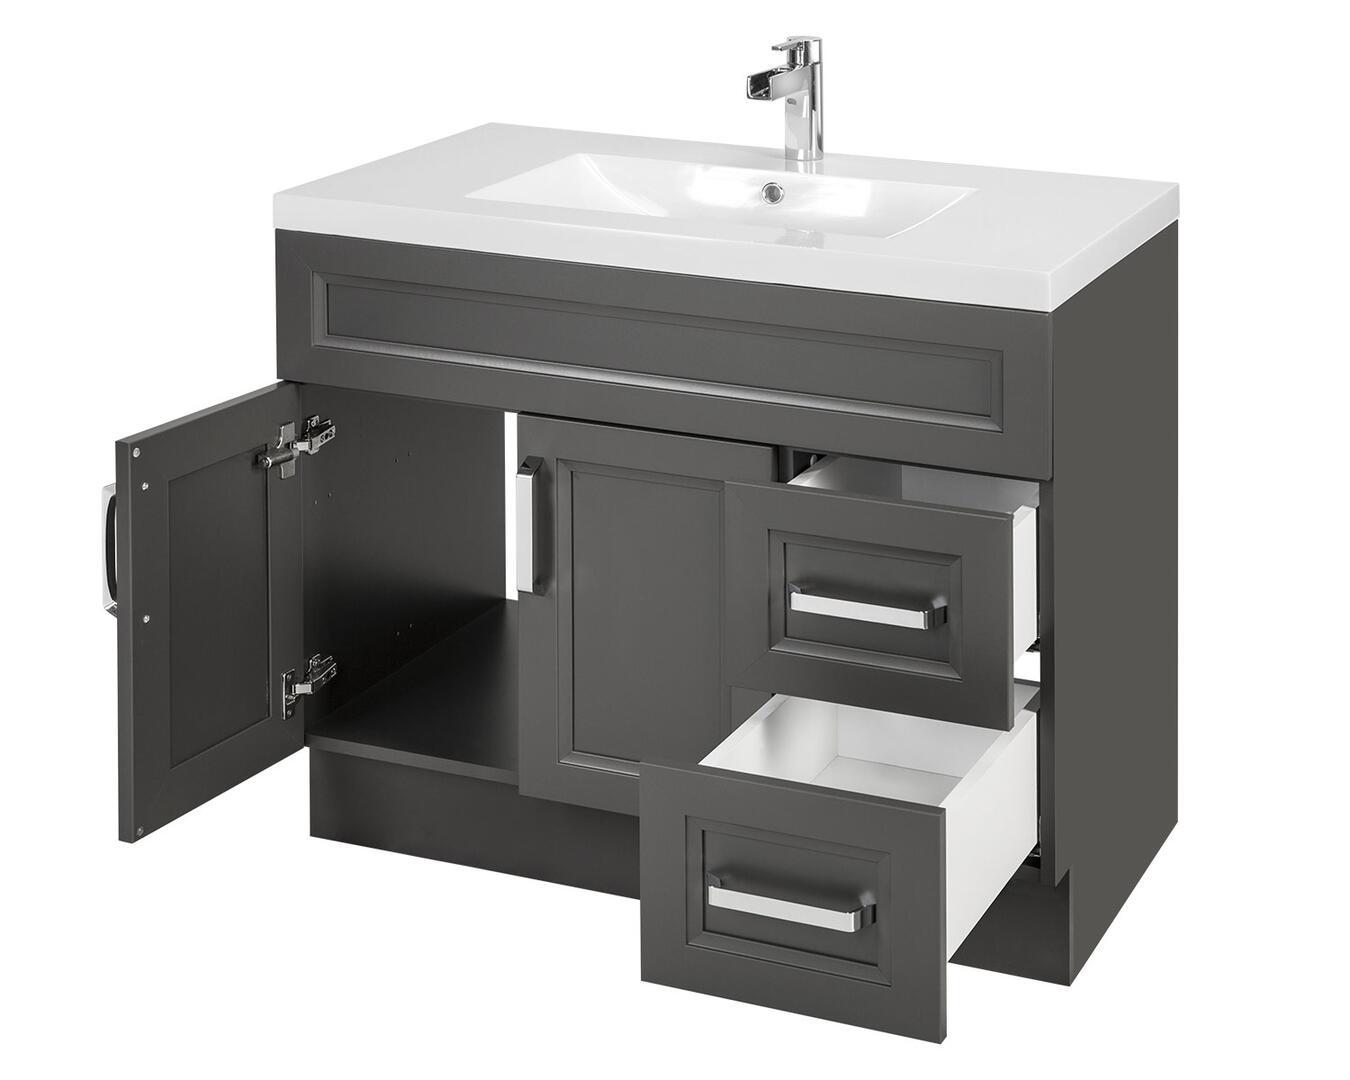 Cutler Kitchen And Bath URBSD36RHT